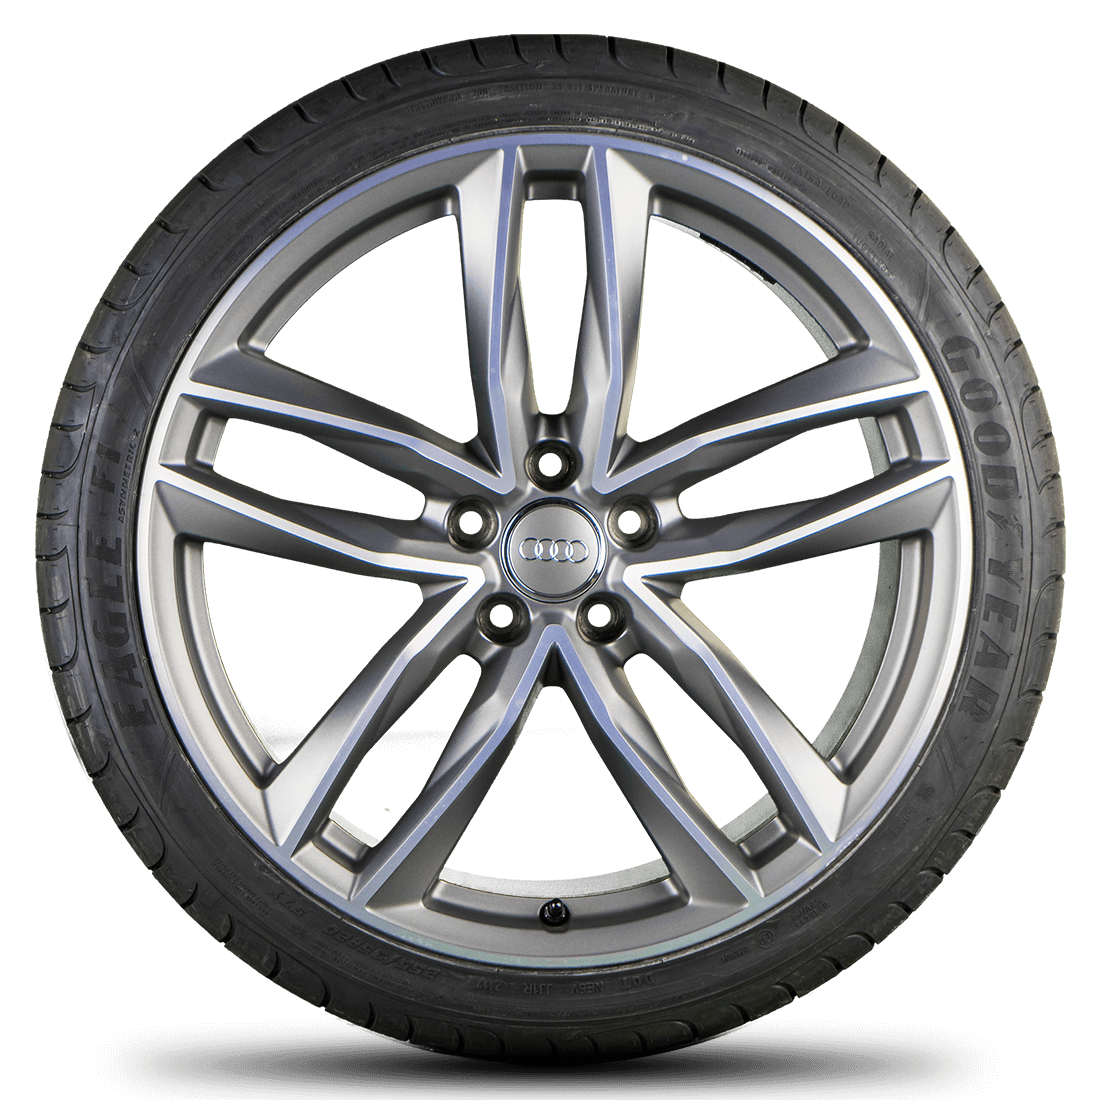 Audi A6 S6 4G 20 Zoll Alufelgen Felgen Sommerreifen S line 4G0601025N NEU